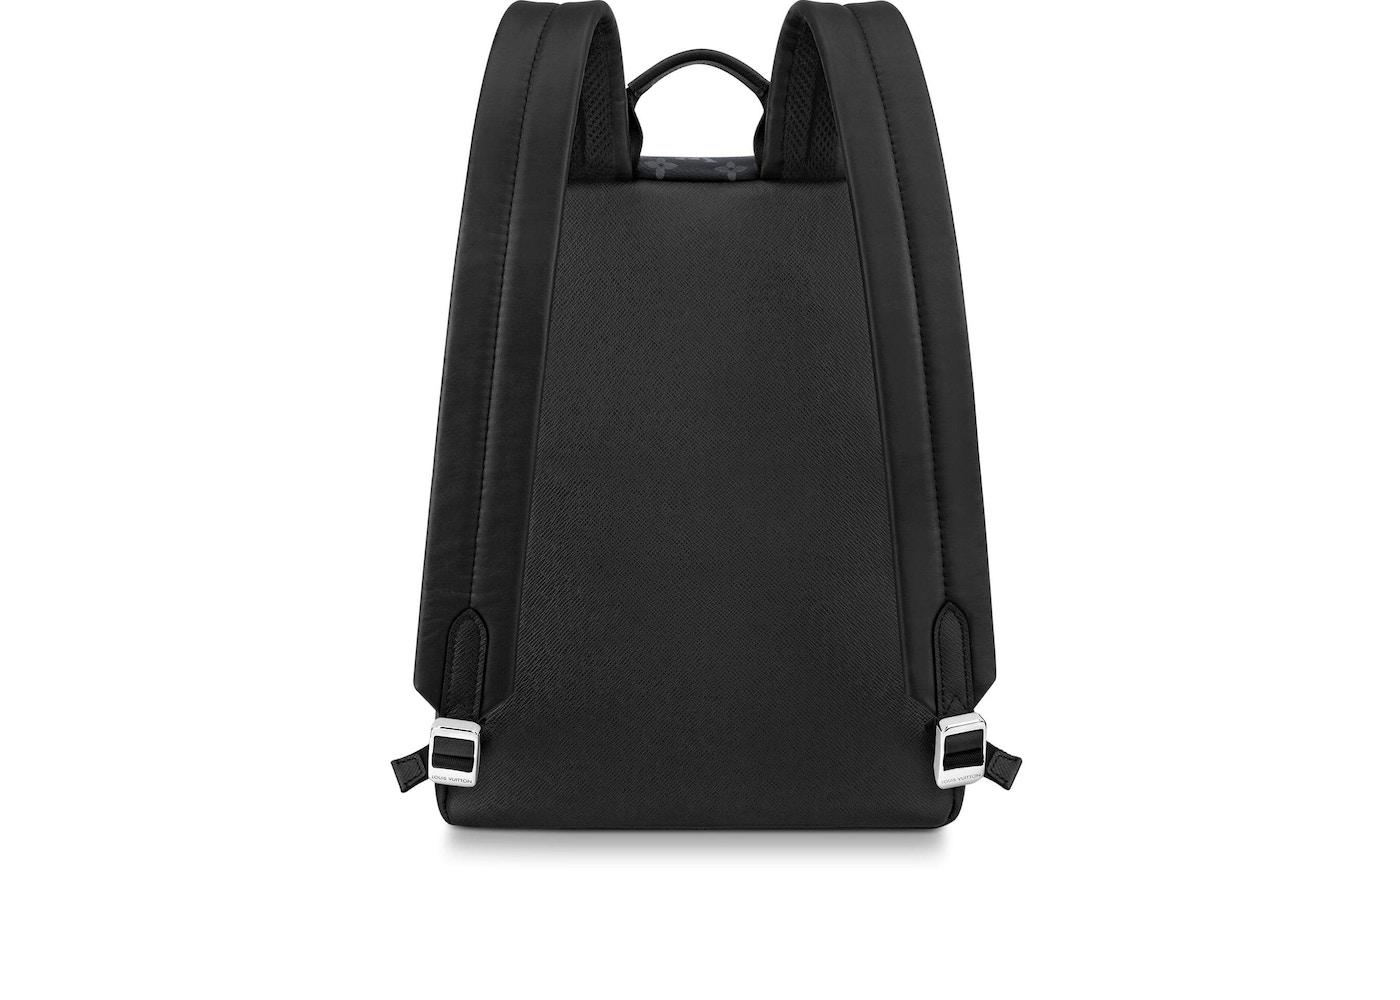 fb2b1910edca Louis Vuitton Discovery Backpack Monogram Eclipse Taiga PM Black